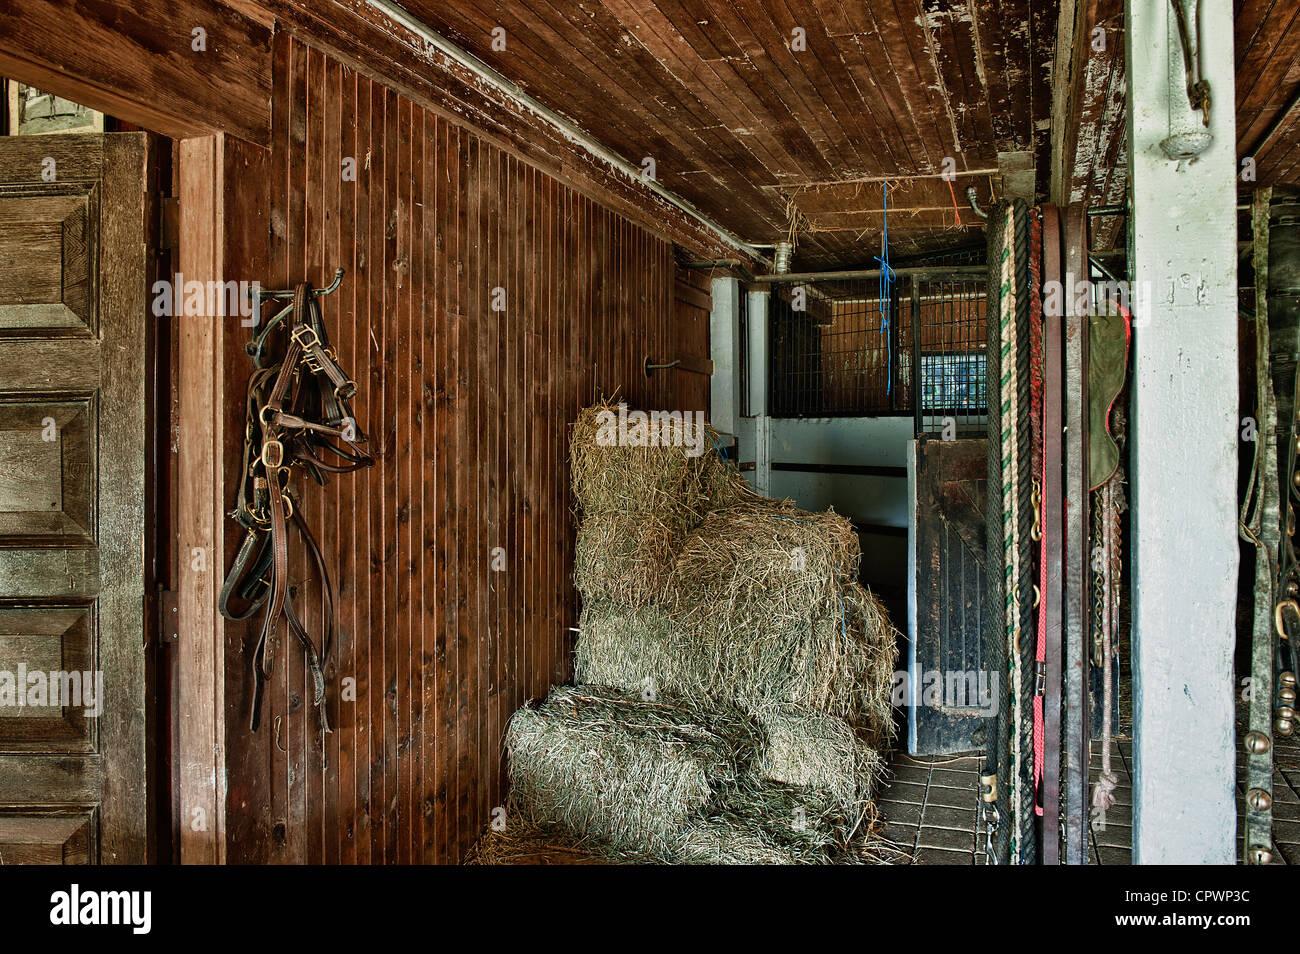 Rustic Stable Interior Stock Photo Alamy